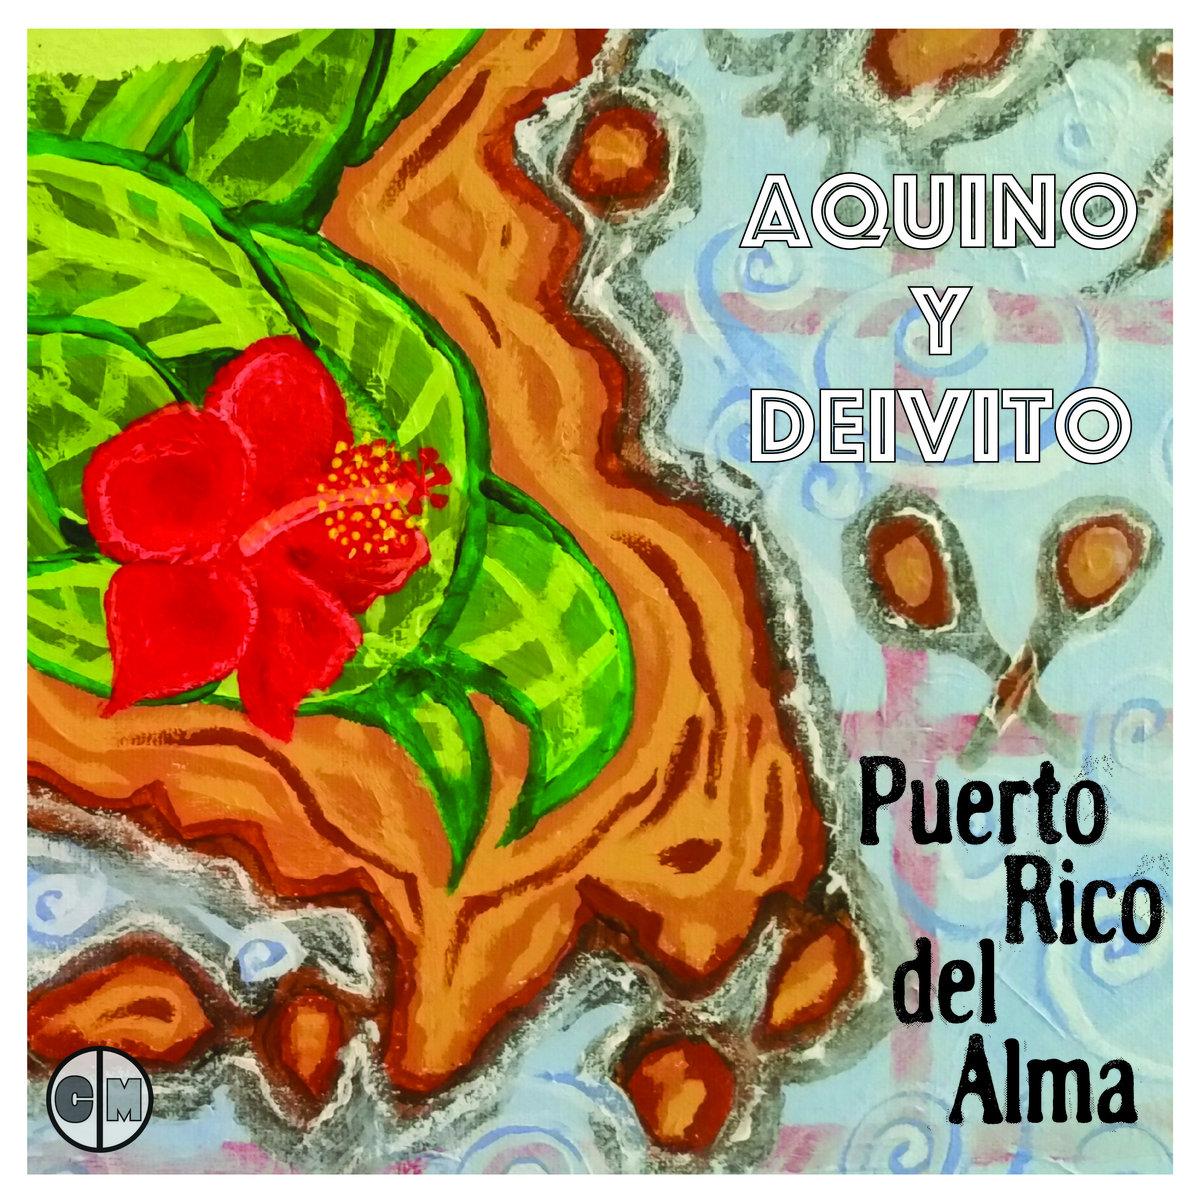 COVER ART BY DEIVIS GARCIA; DESIGN by MICHAEL AQUINO